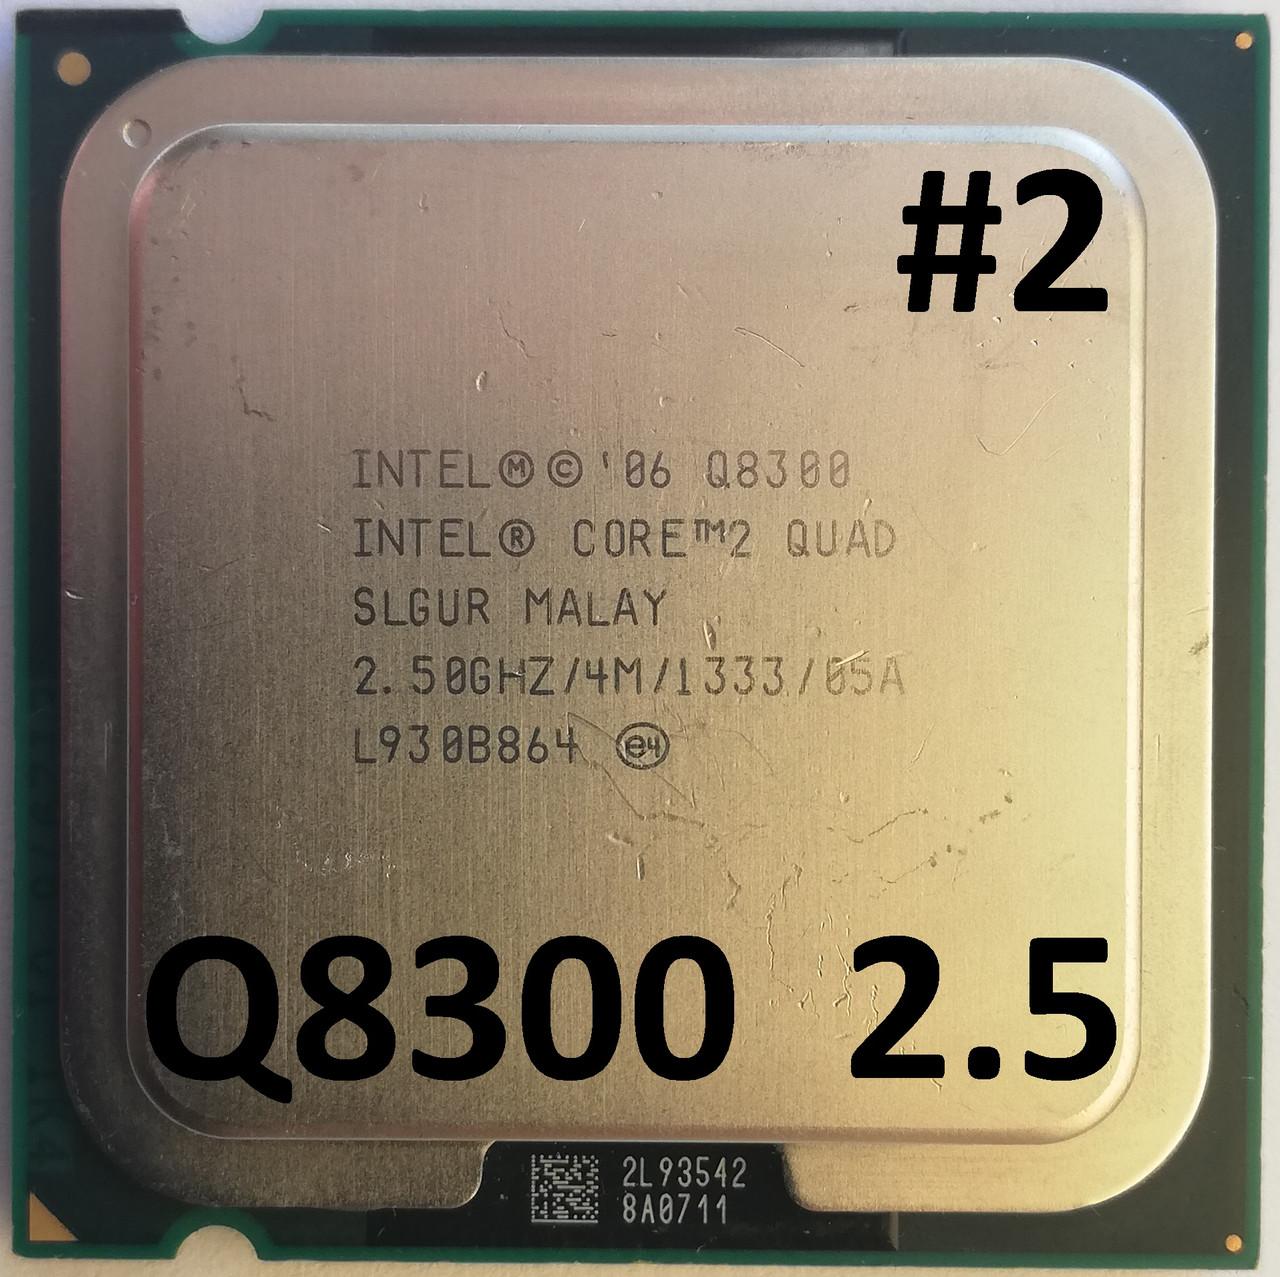 Процессор ЛОТ#2 Intel® Core™2 Quad Q8300 SLB5W 2.5GHz 4M Cache 1333 MHz FSB Socket 775 Б/У